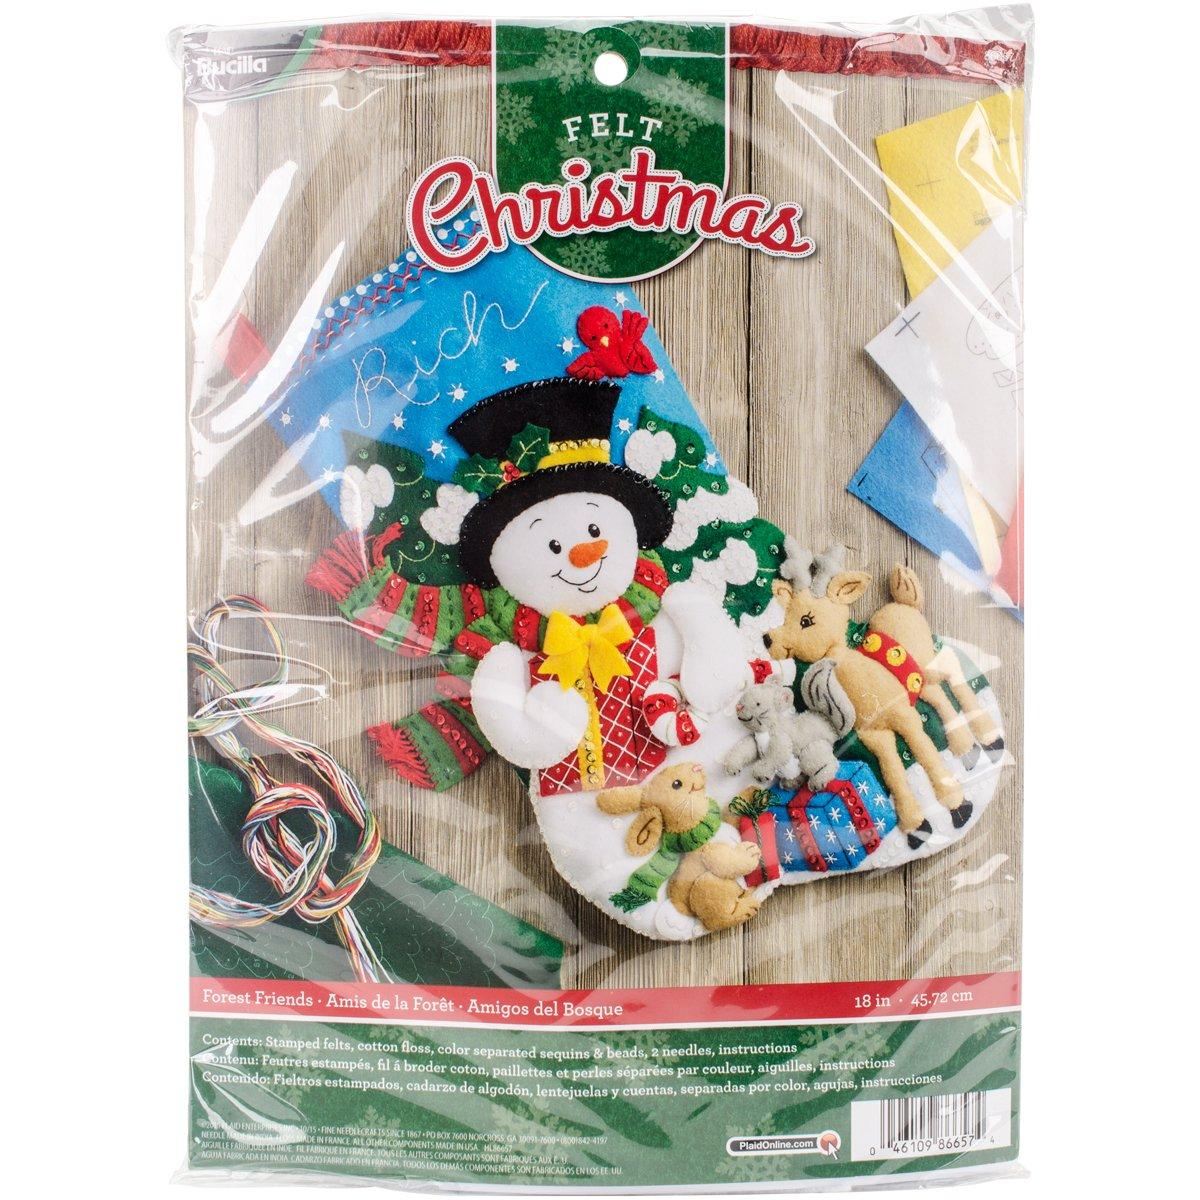 Bucilla 18-Inch Christmas Stocking Felt Applique Kit, 86657 Forest Friends Plaid Inc